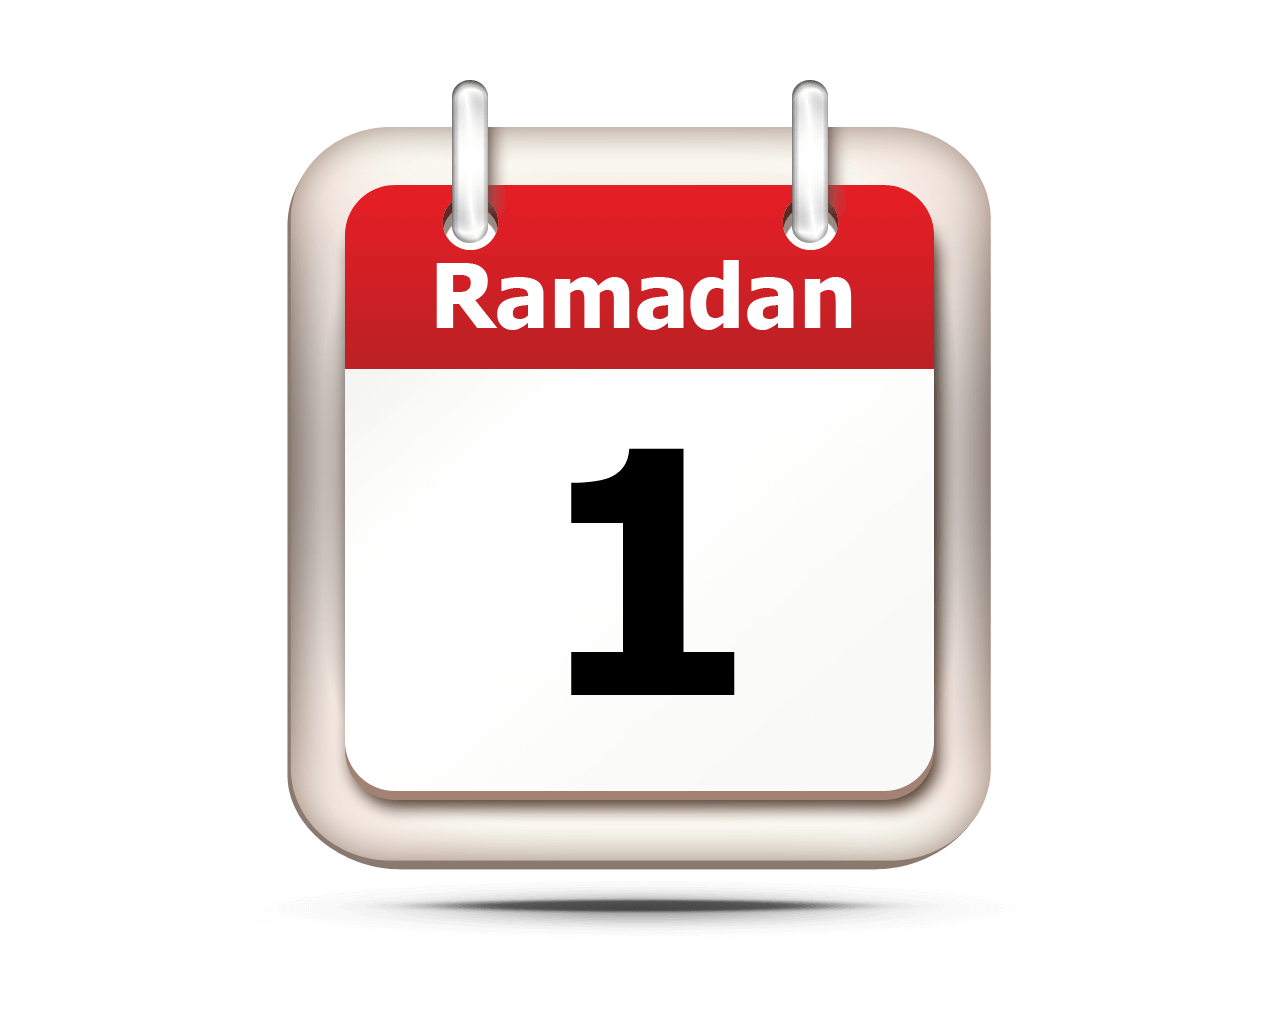 Ramadan 1439 will start Thur. May 17th